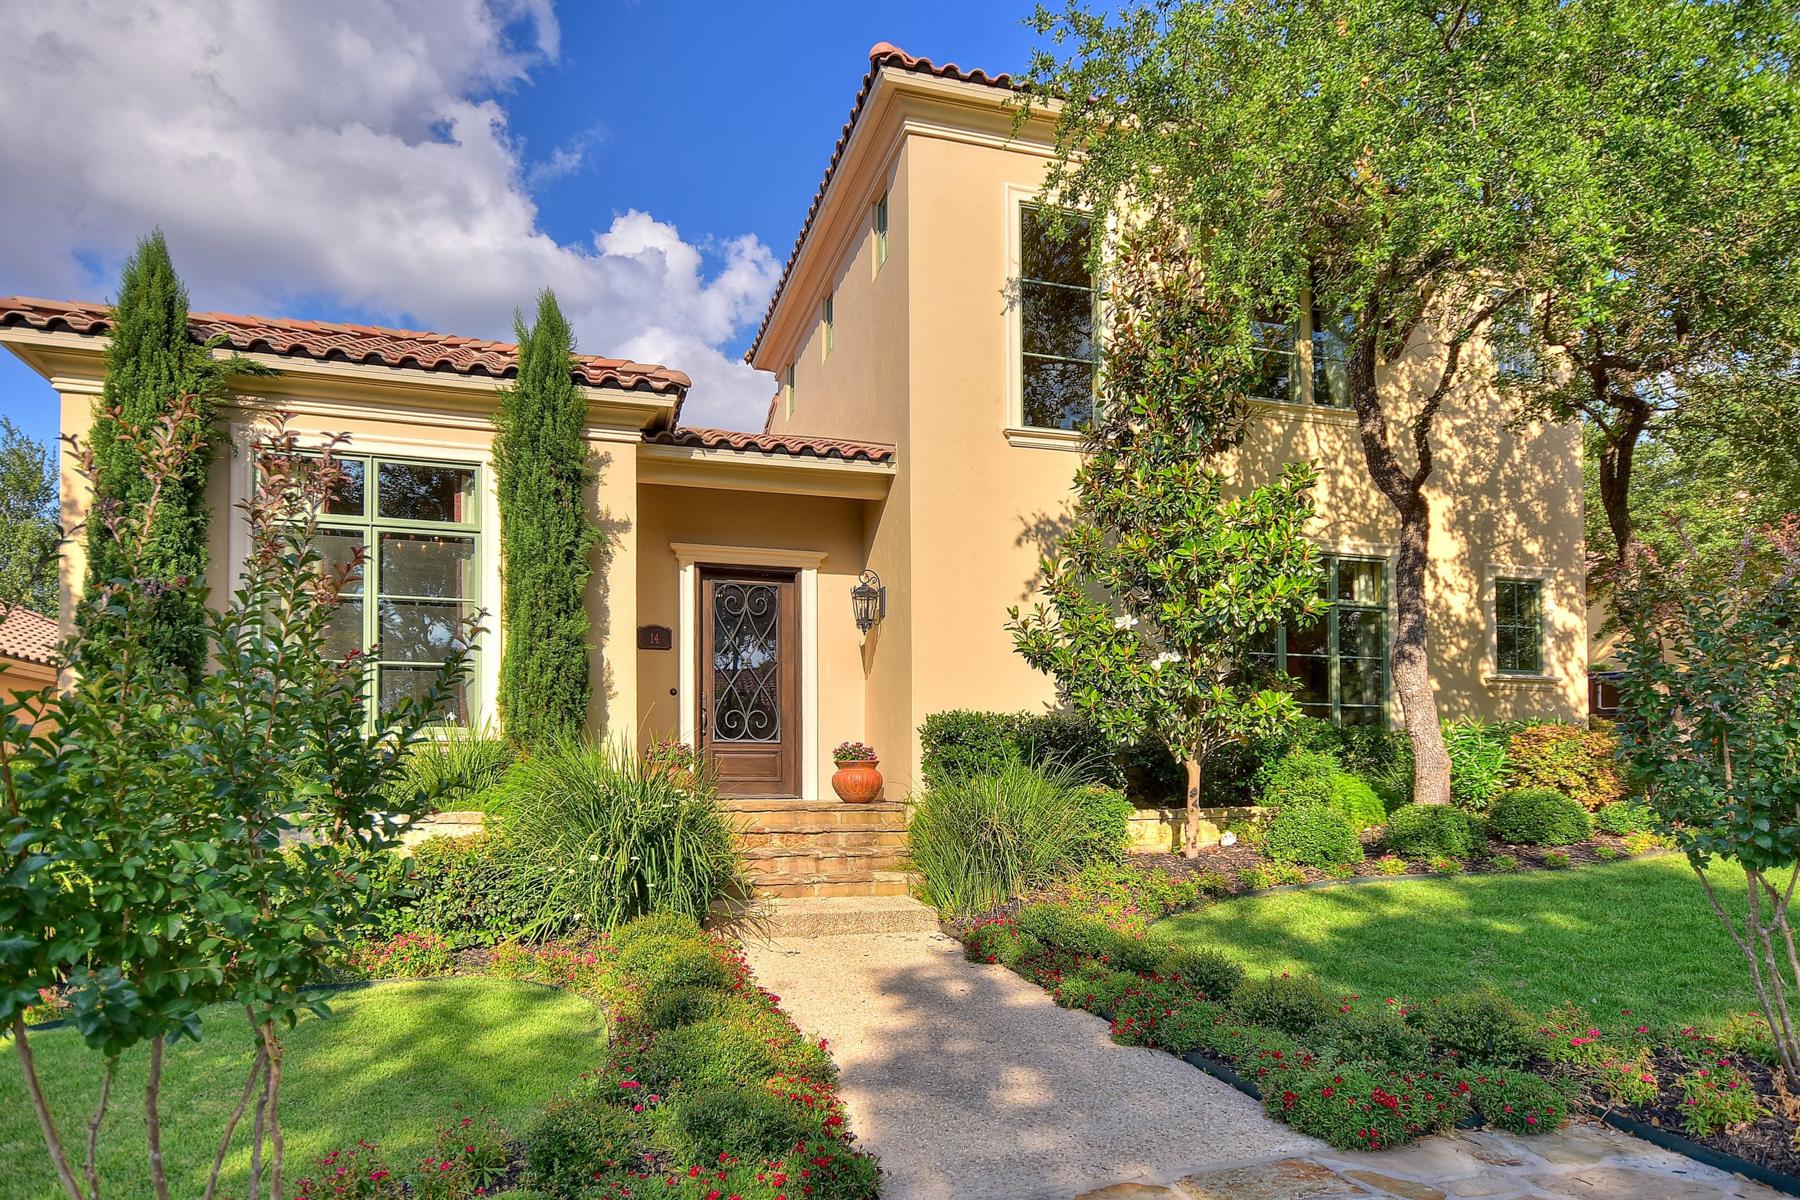 獨棟家庭住宅 為 出售 在 Impeccable Gem in The Dominion 14 Venice Ct The Dominion, San Antonio, 德克薩斯州, 78257 美國